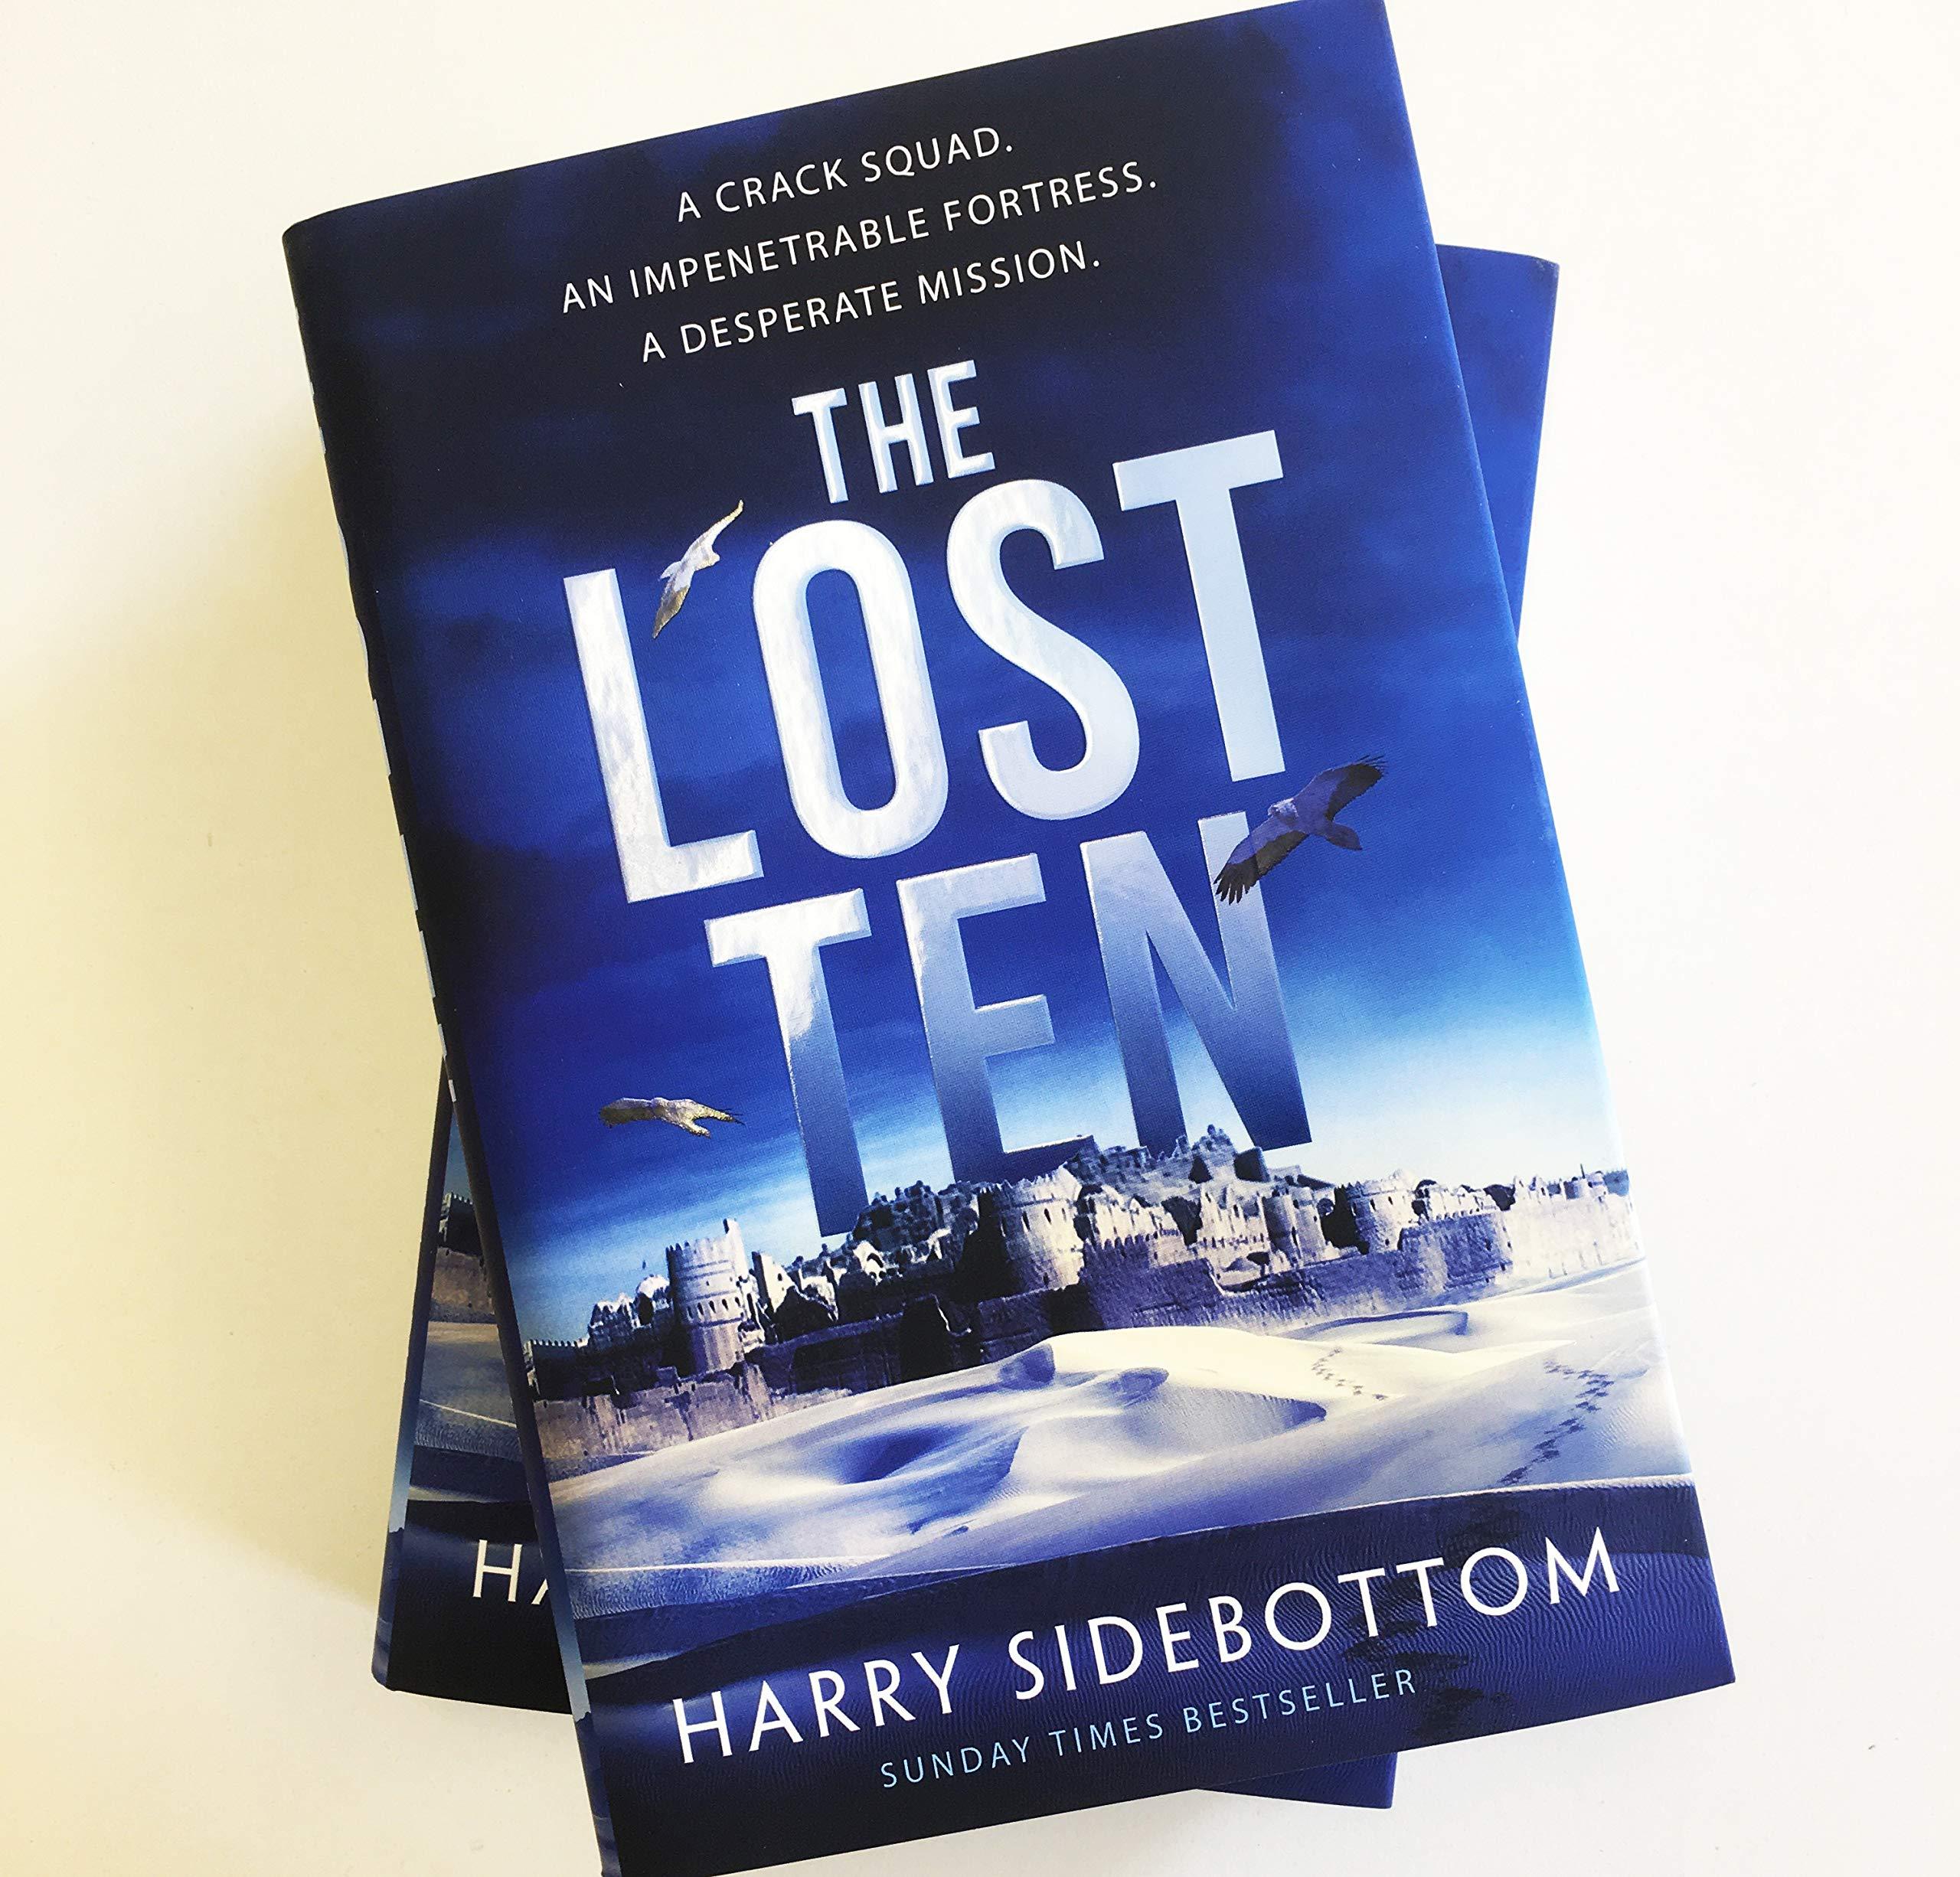 Harry_Sidebottom_The_Lost_Ten